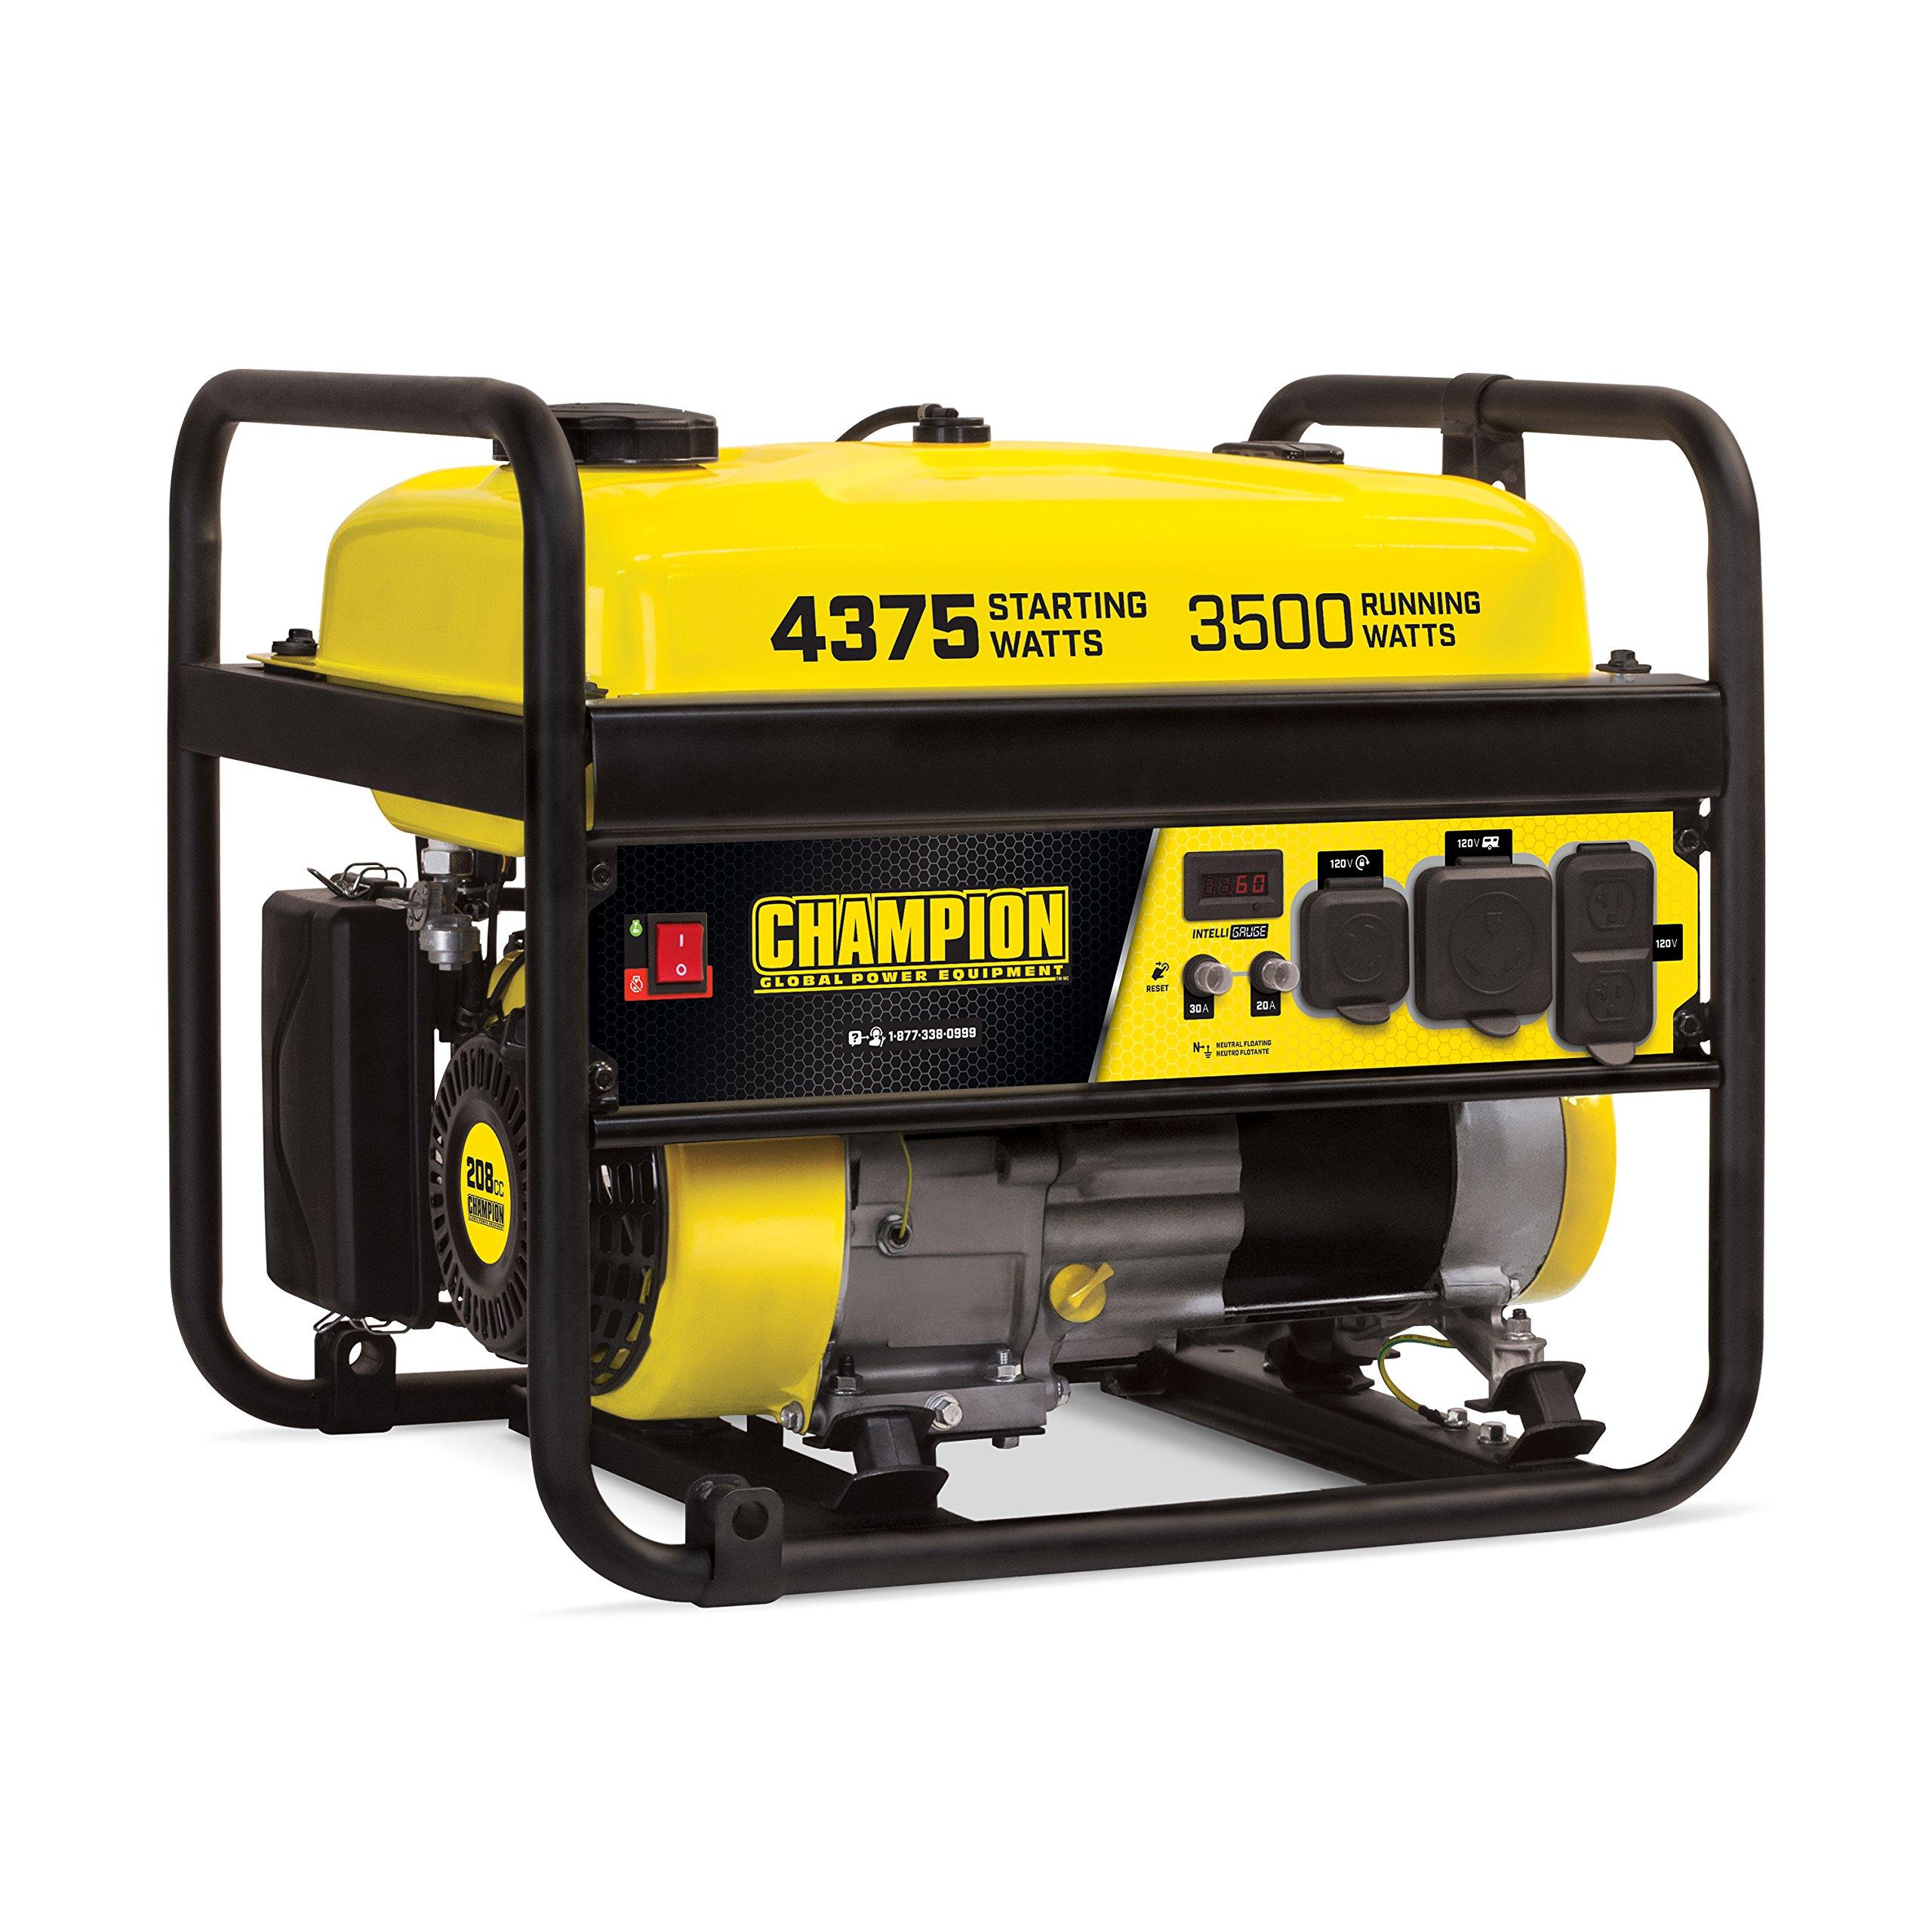 Champion Power Equipment 100555 RV Ready Portable Generator, Yellow and Black by Champion Power Equipment (Image #1)